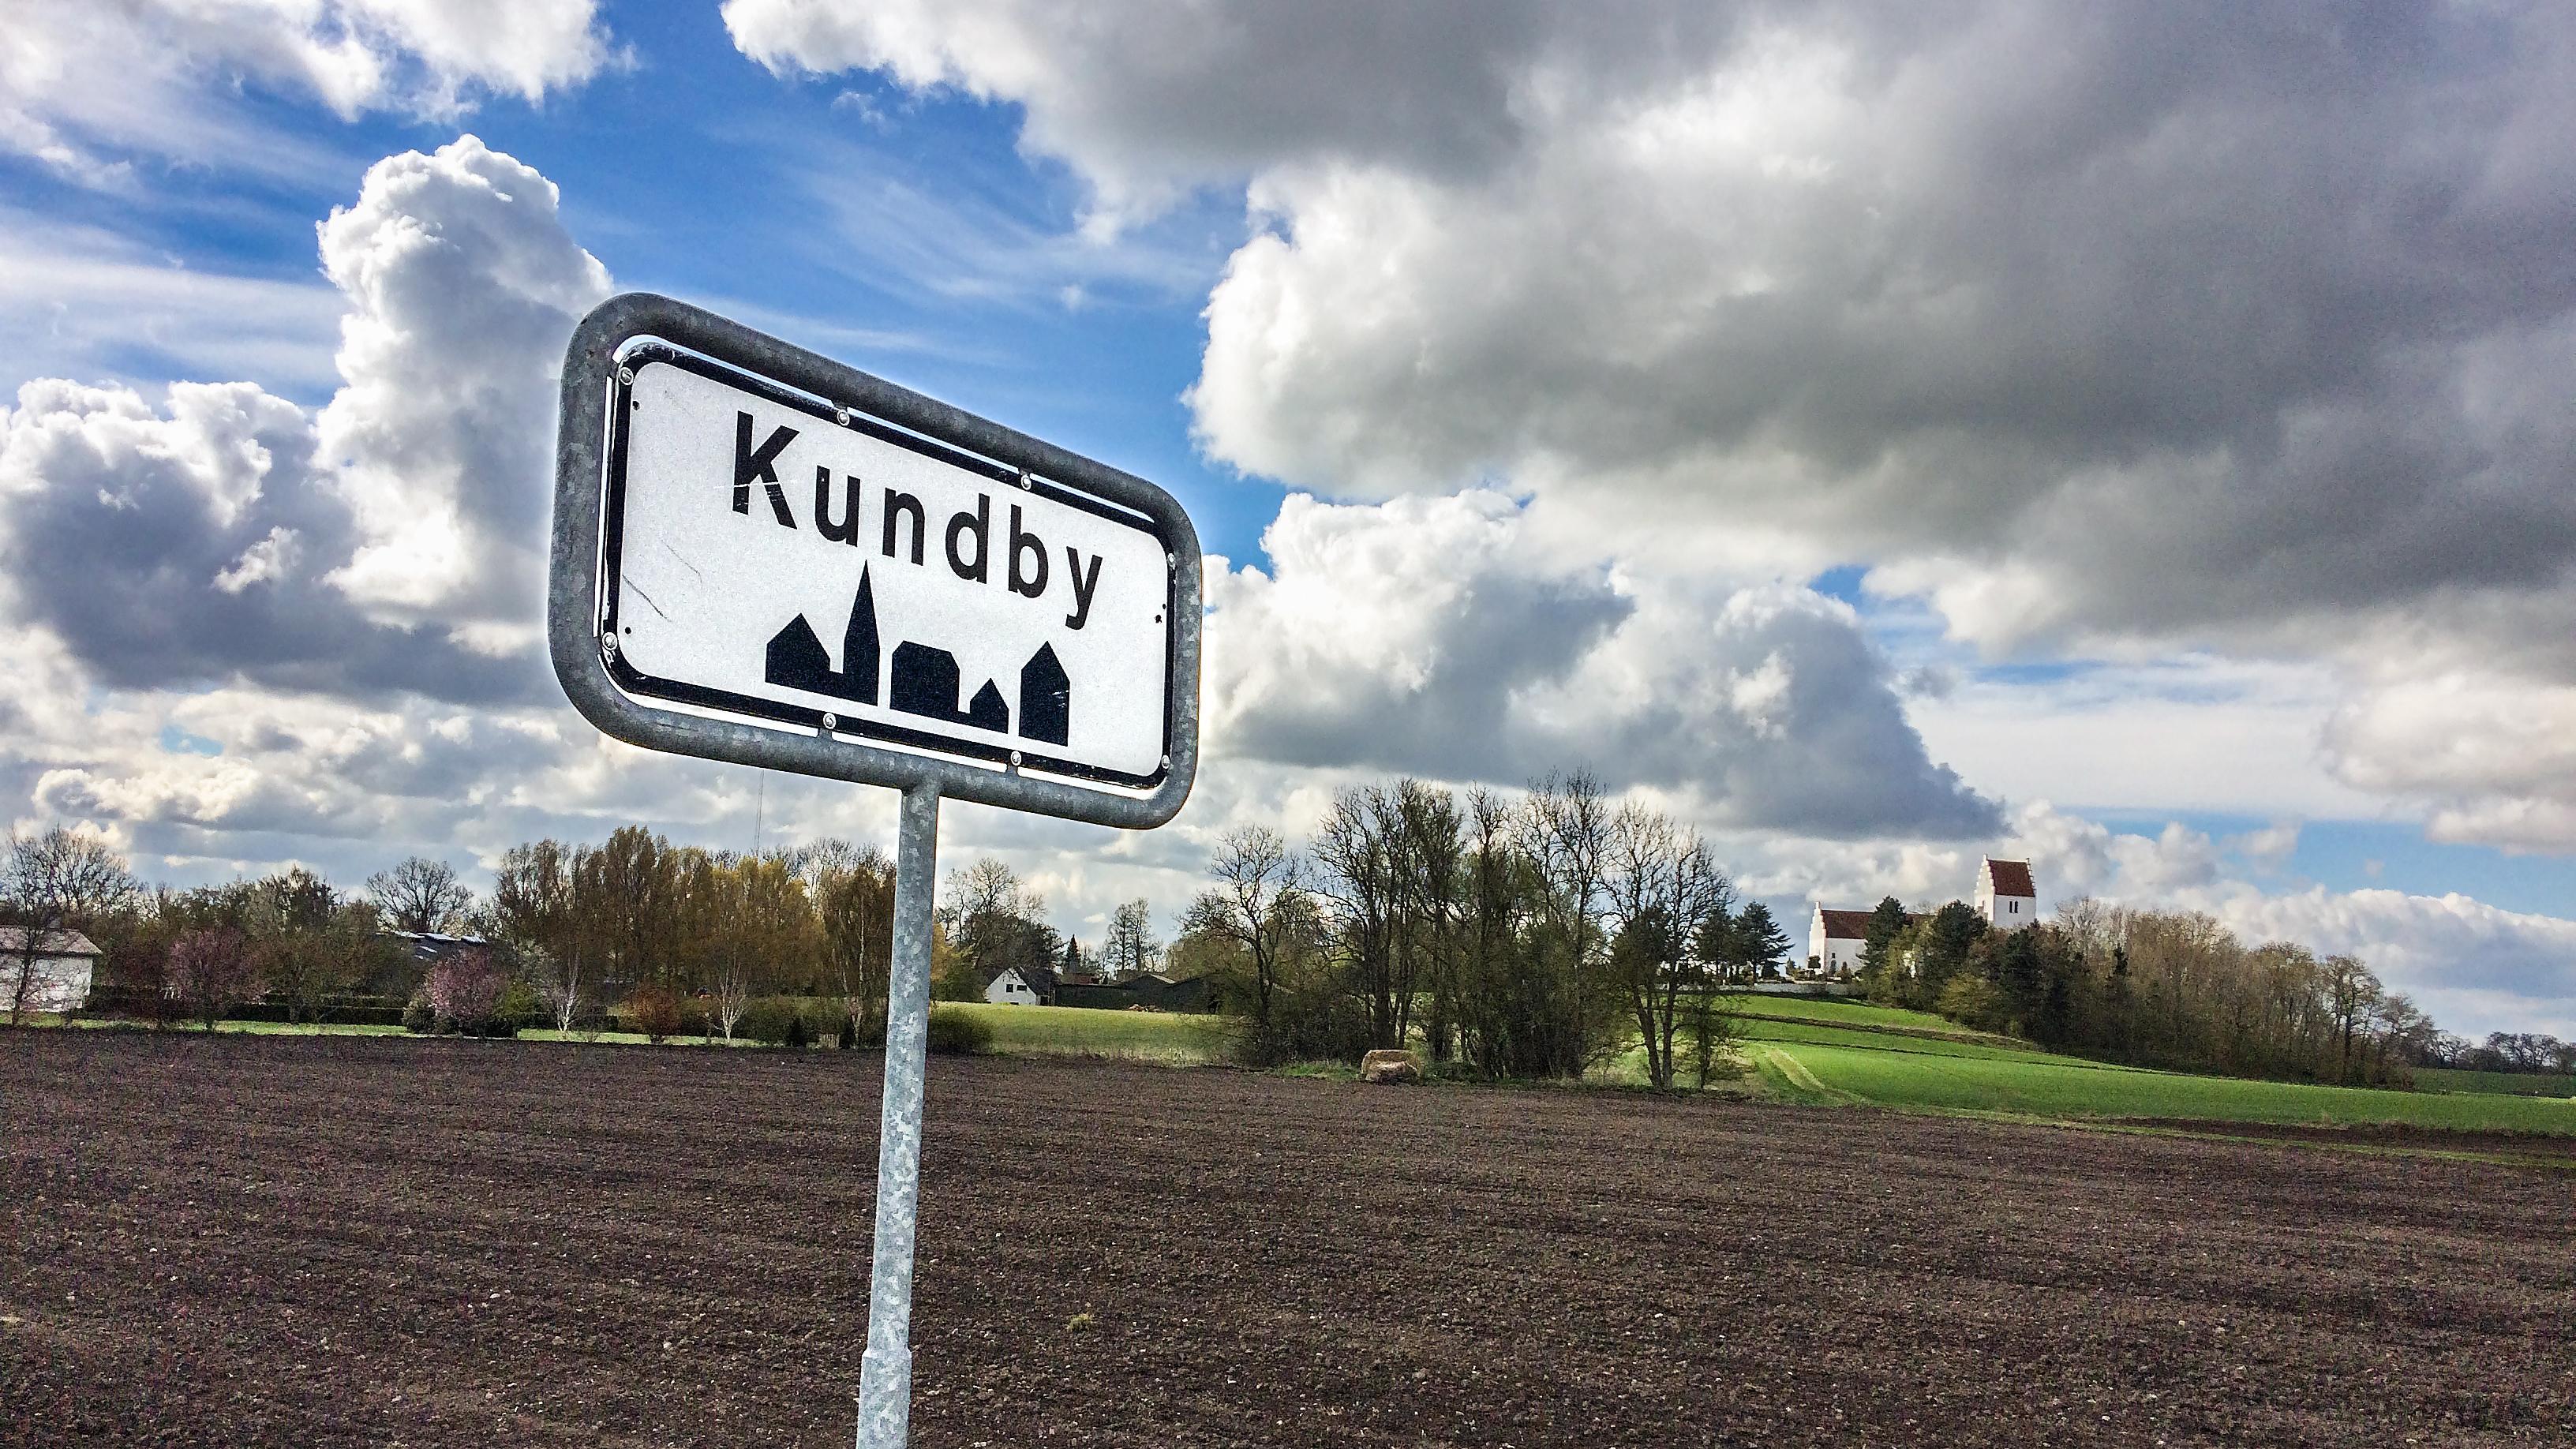 kundby_byskilt.jpg